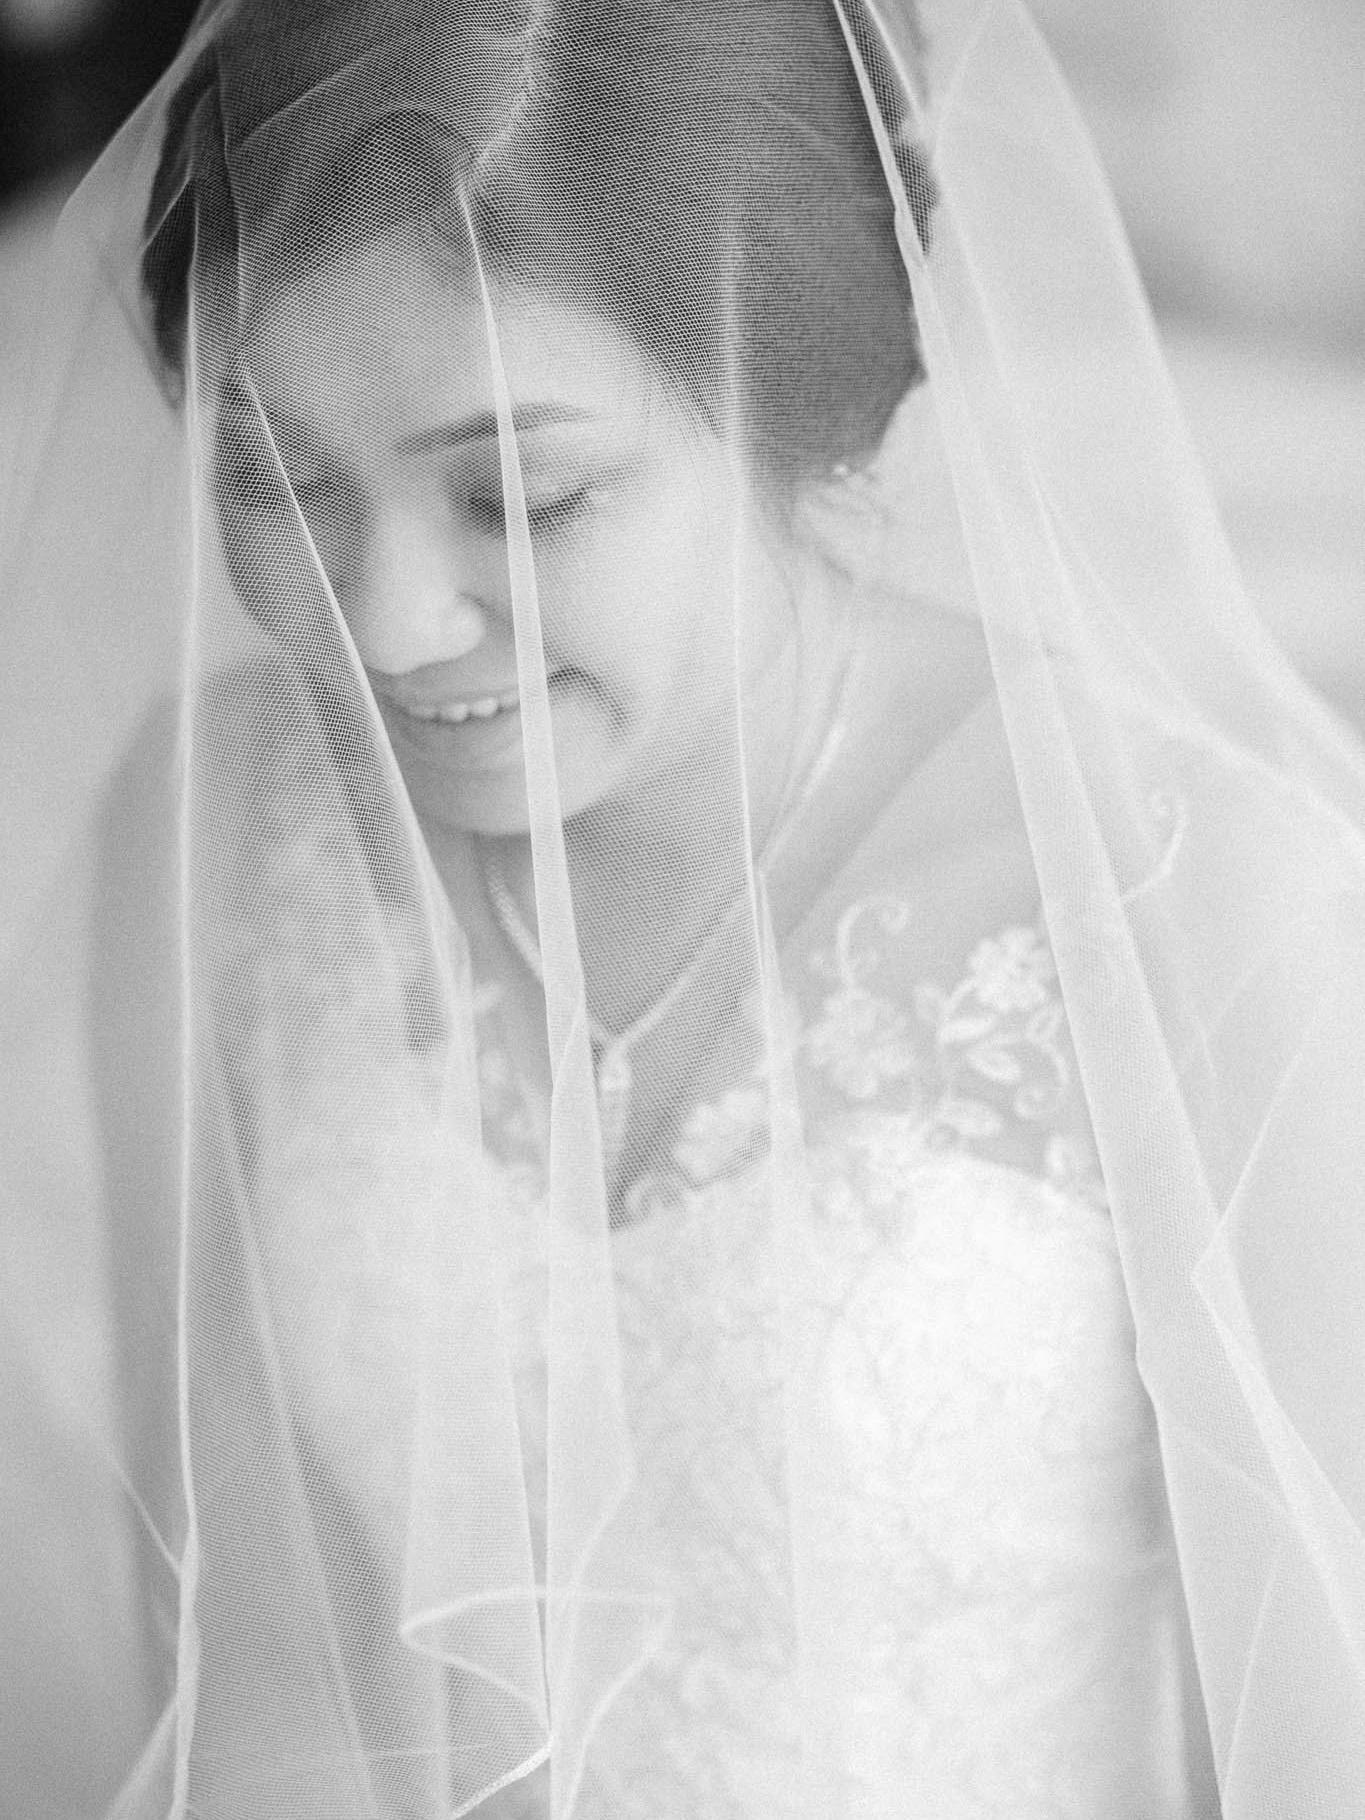 singapore-wedding-photographer-malay-indian-pre-wedding-travel-wmt-2015-jeremy-larissa-15.jpg